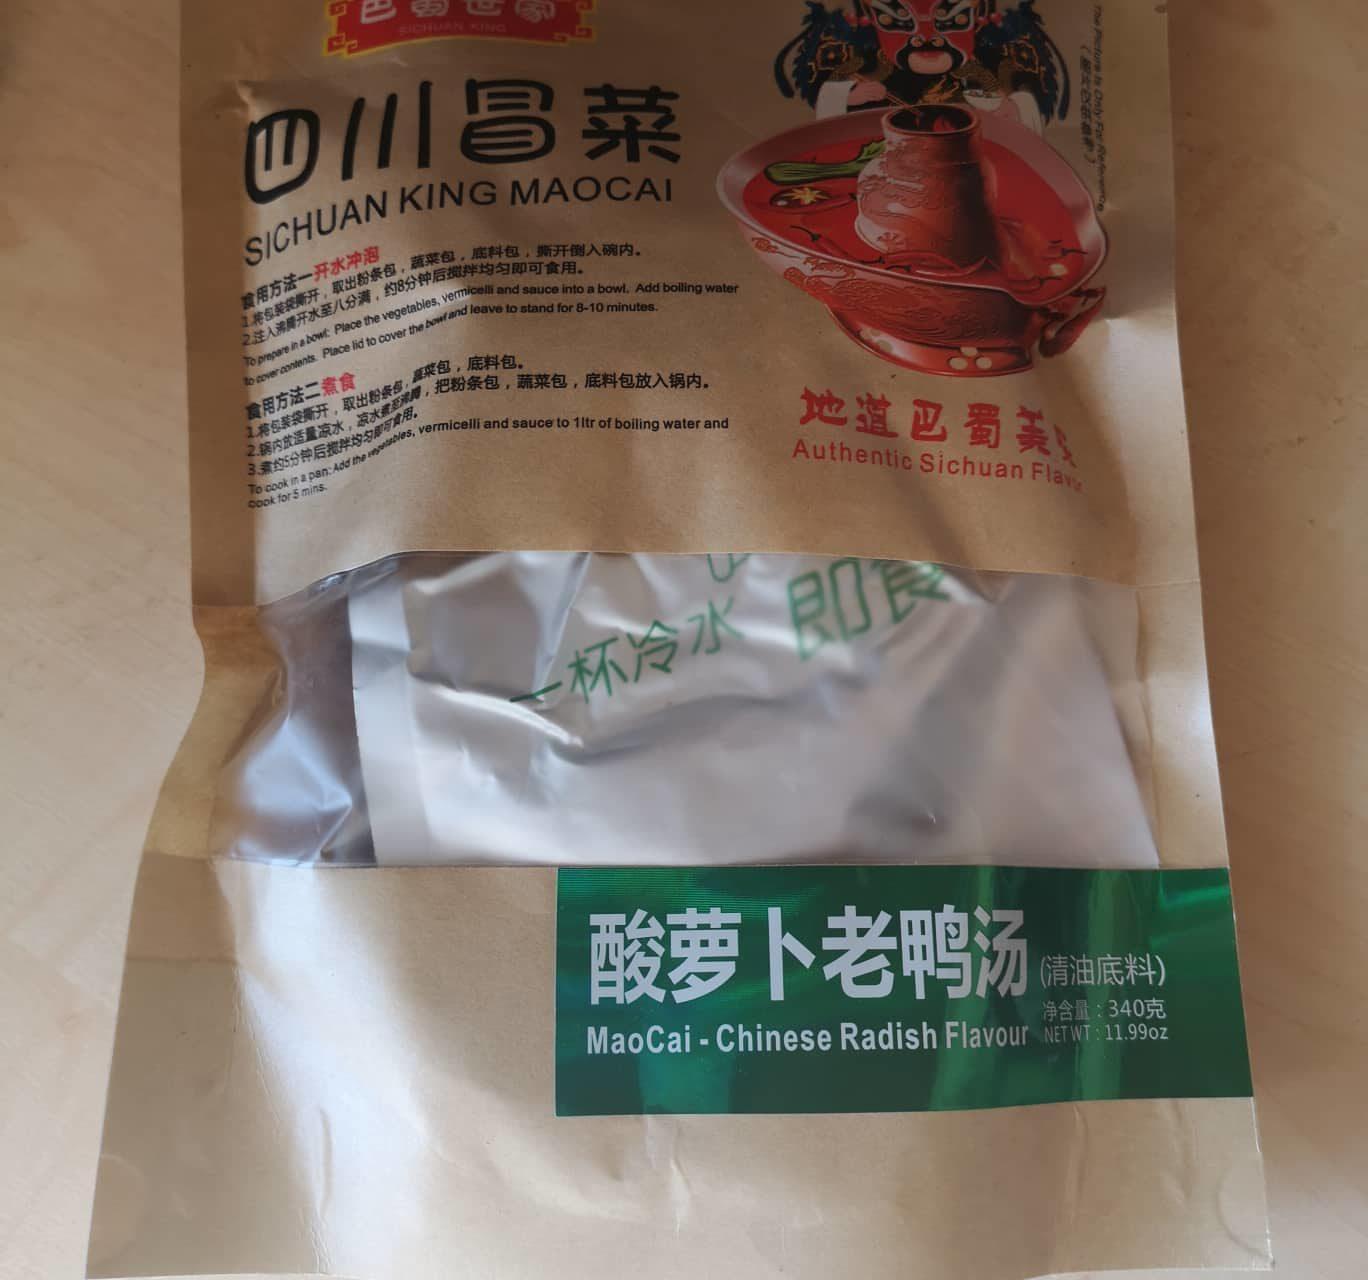 "#1654: Sichuan King Maocai ""MaoCai - Chinese Radish Flavour"""